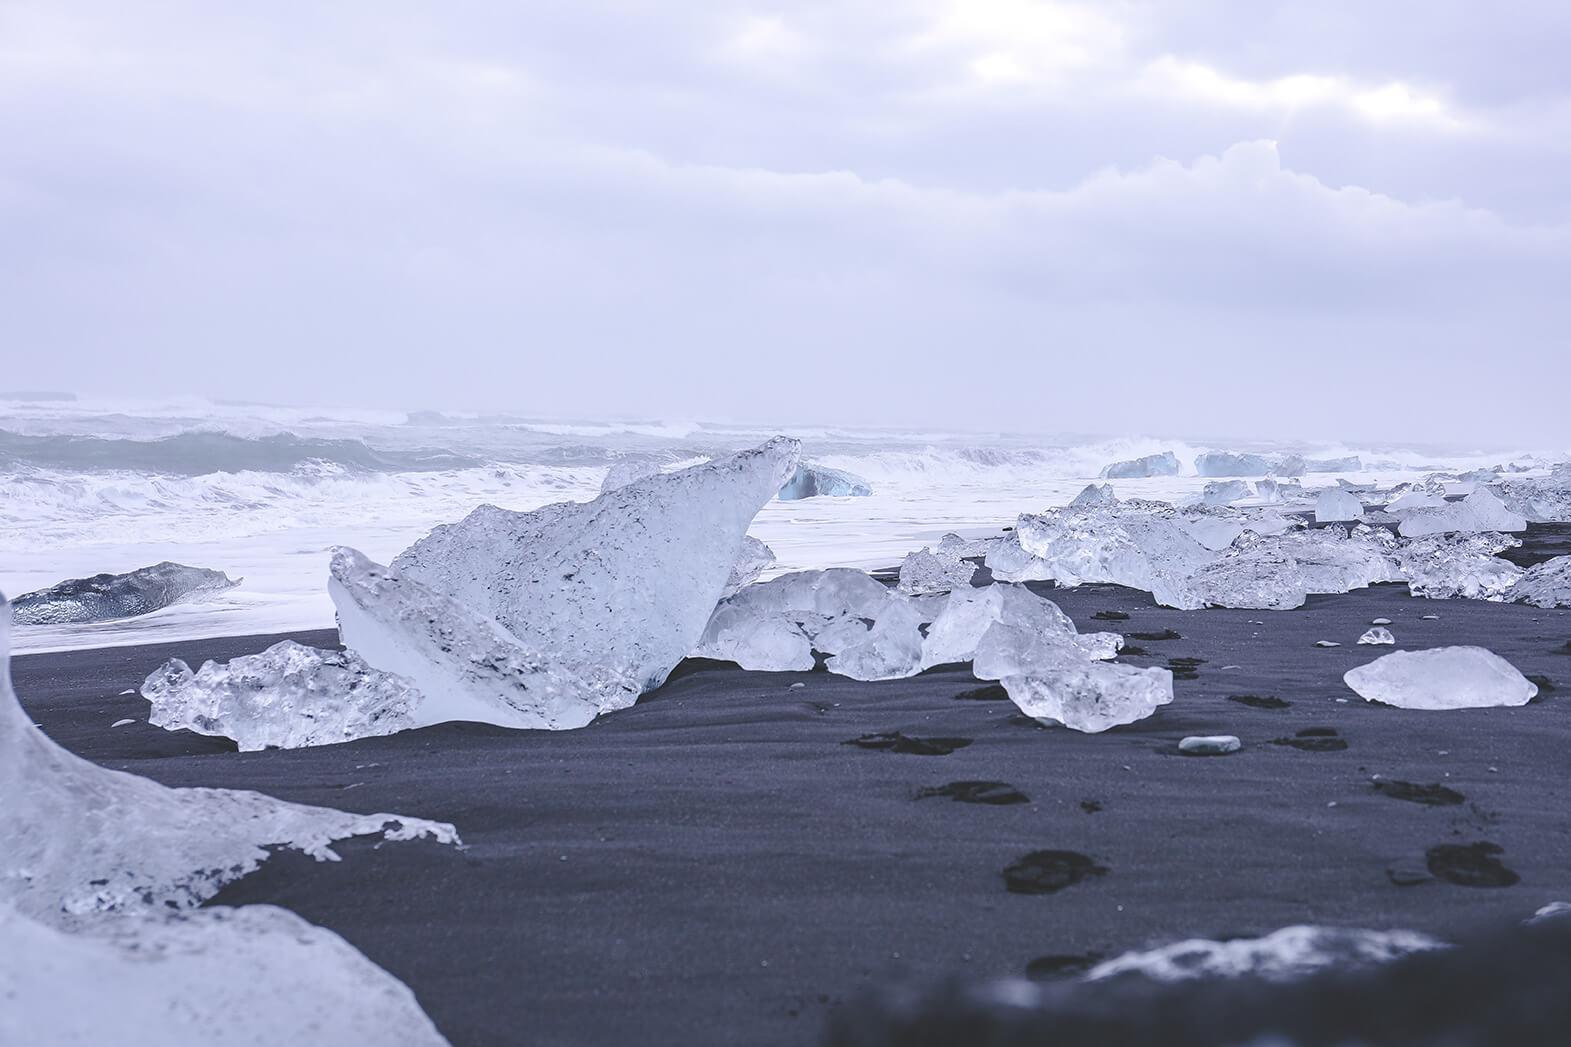 Iceland Sights - Ice pieces at the glacier lagoon Jökulsarlon.